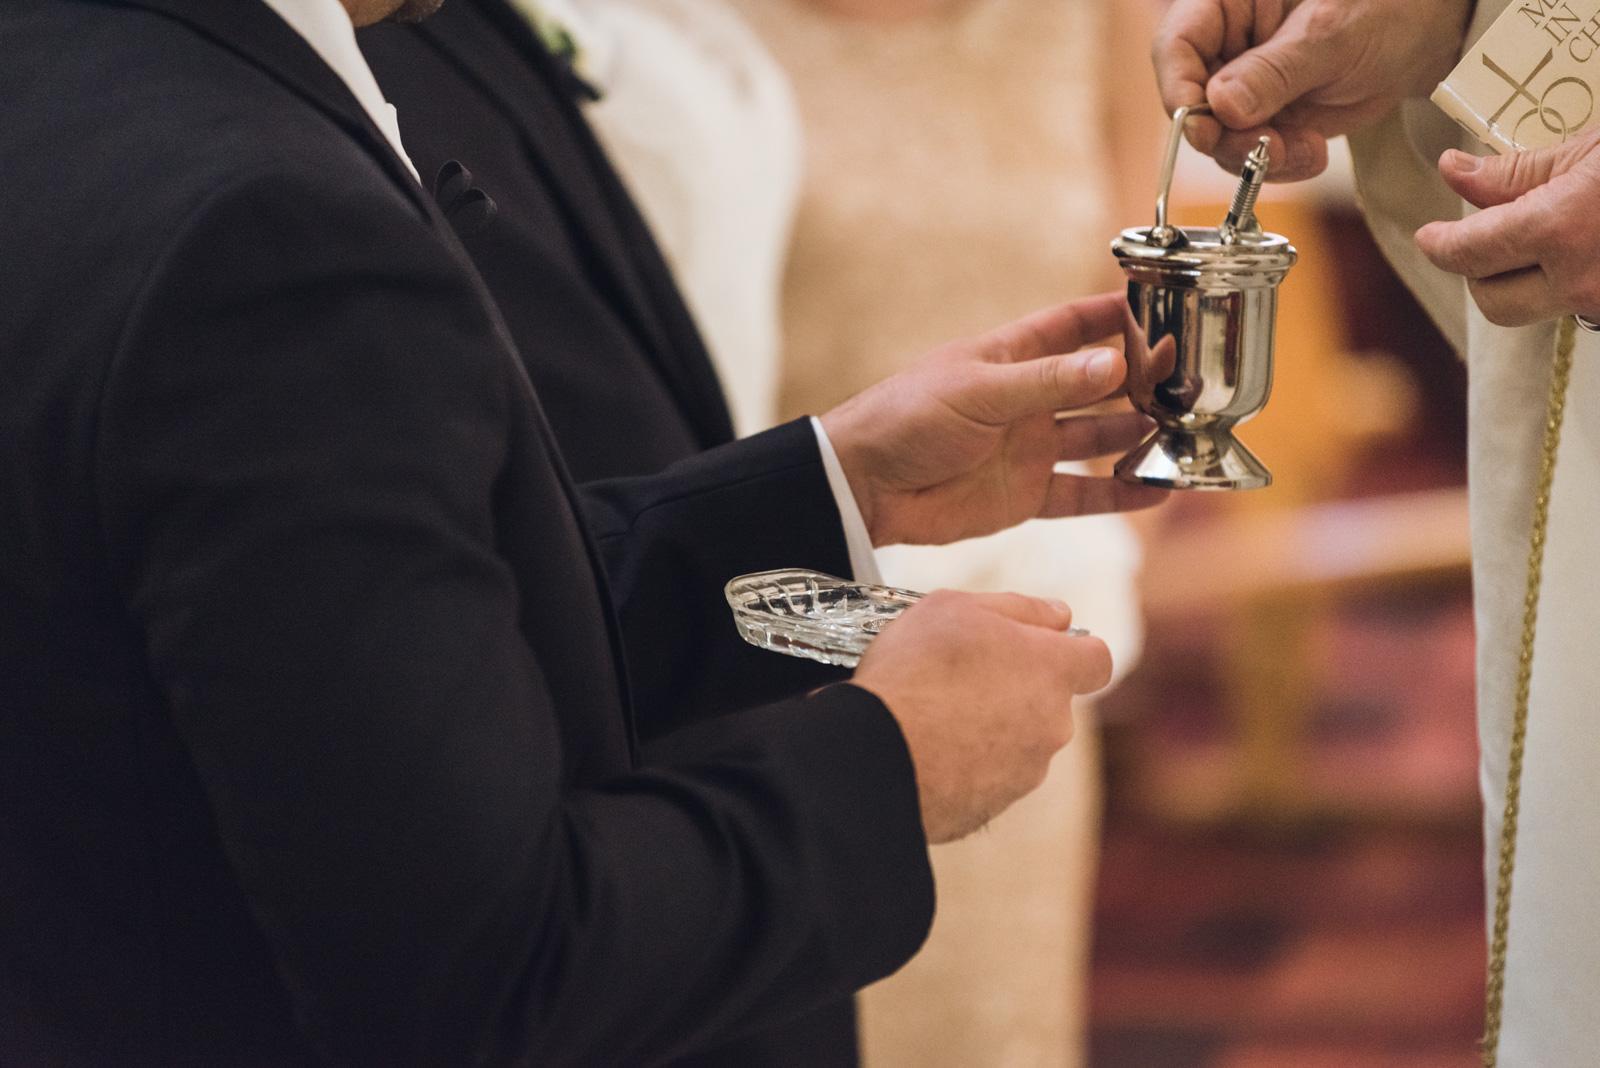 rheana-chris-wedding-blog-116.jpg